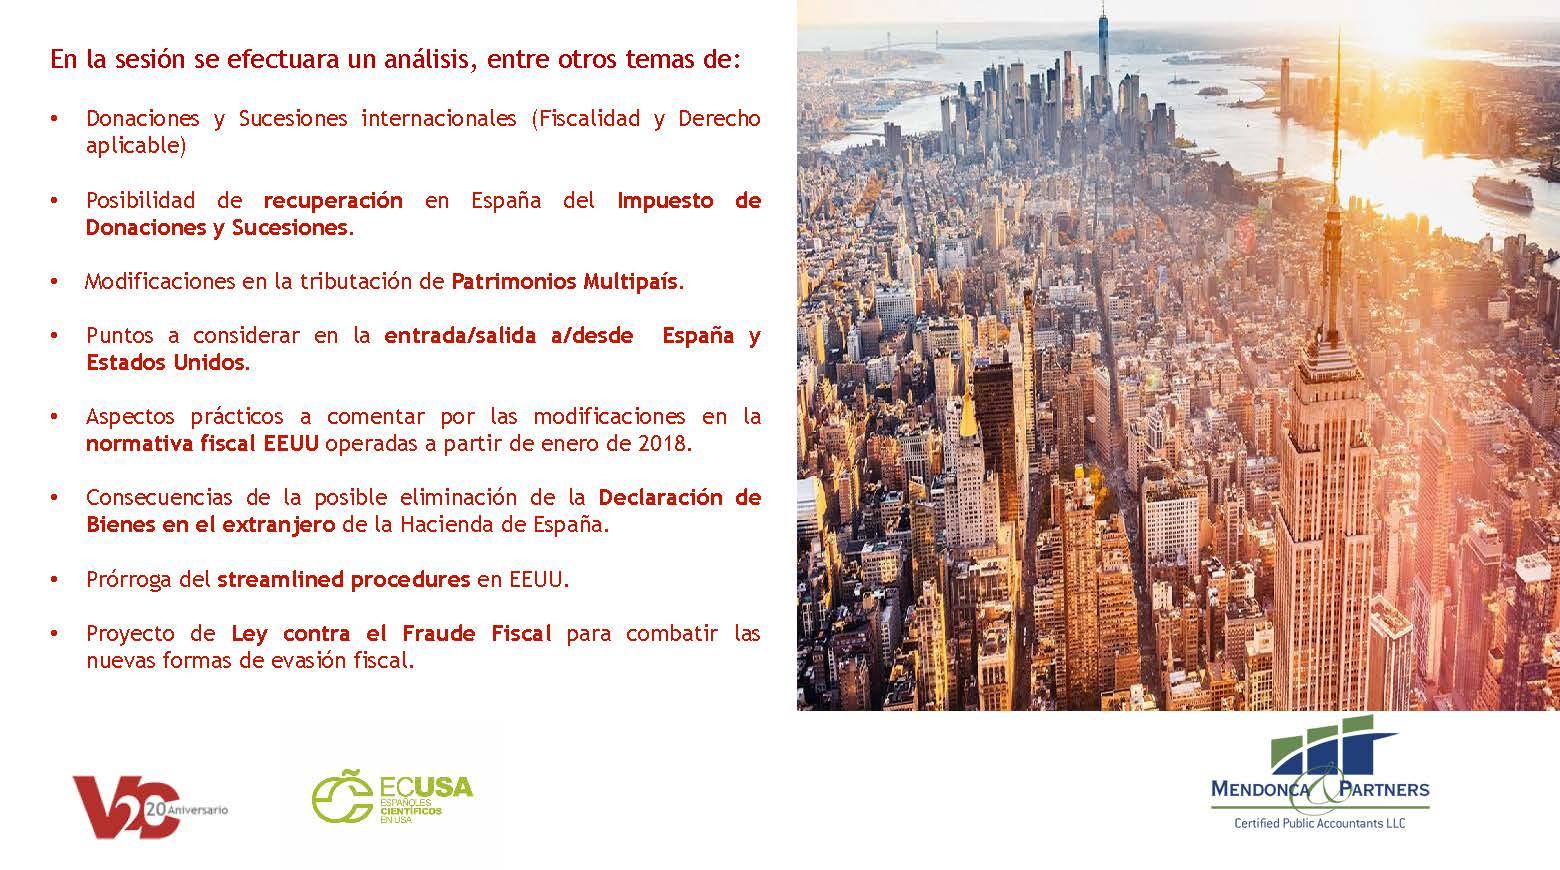 ECUSA Fiscalidad  USA España 2019 V2C MP NYC_Page_2.jpg